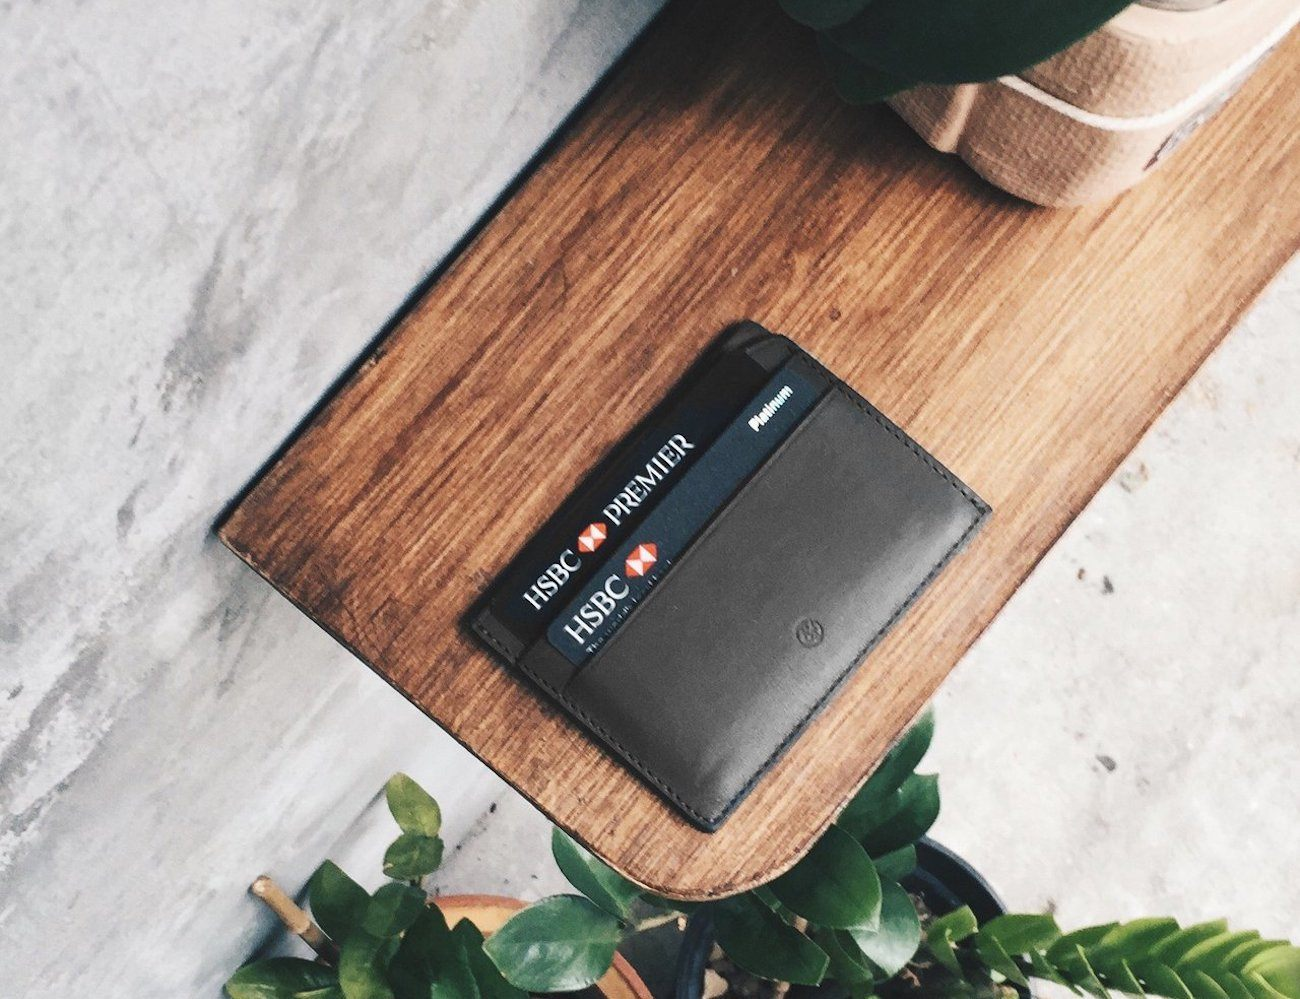 Nolan+2.0+Leather+Card+Holder